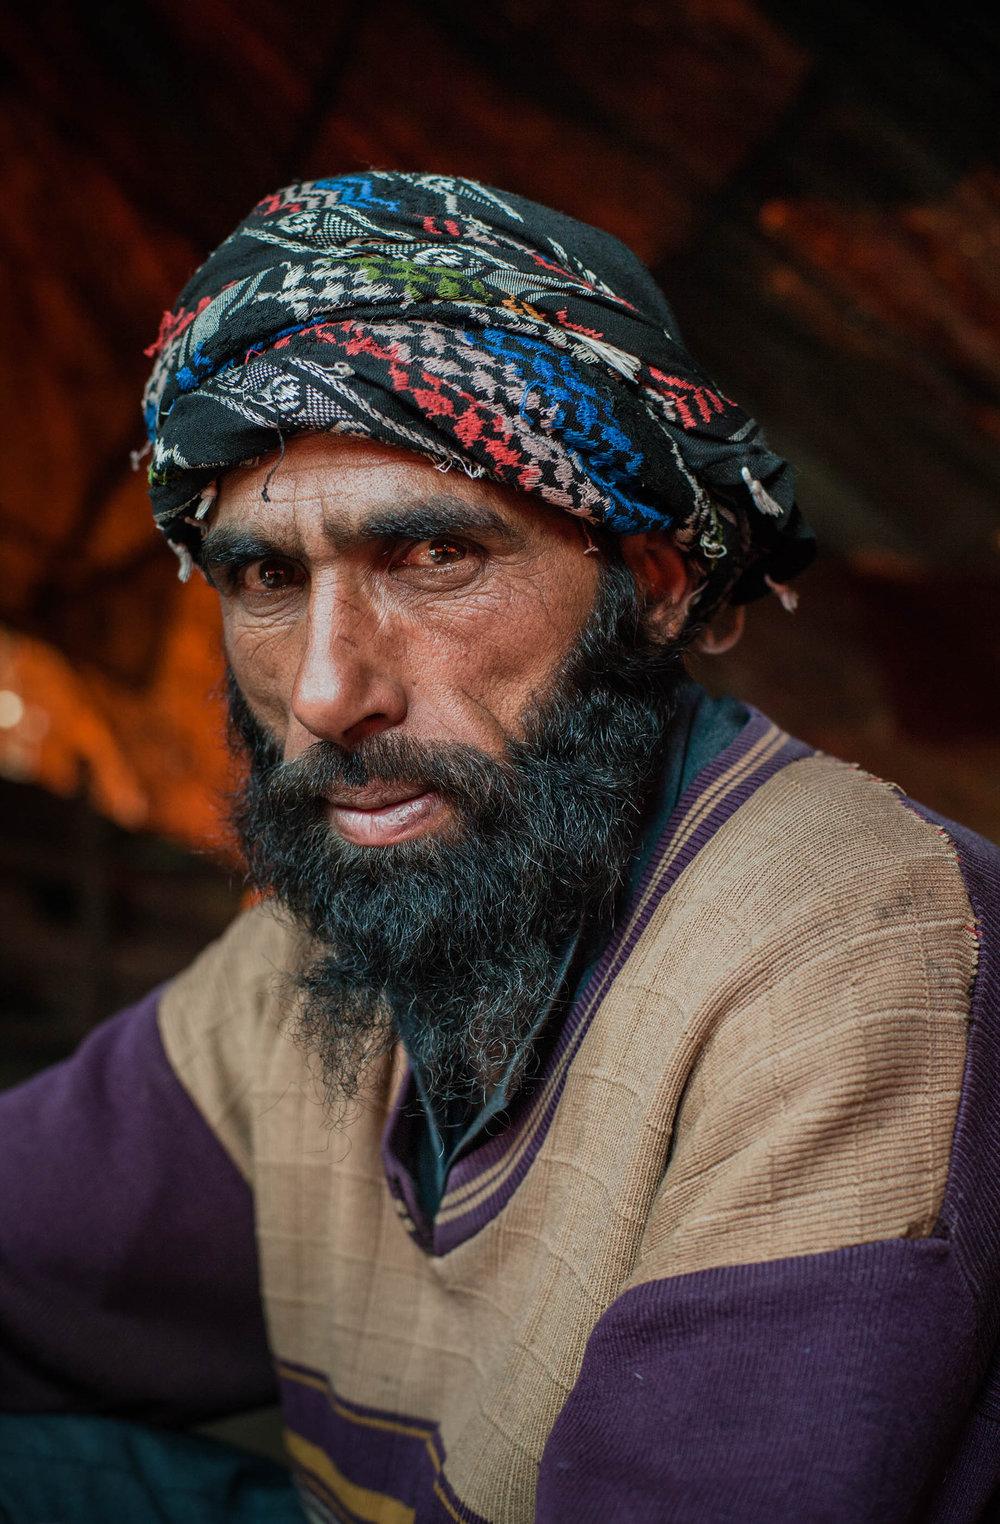 M - Ozzie-Hoppe-Photographer-India-Himalaya_a.jpg